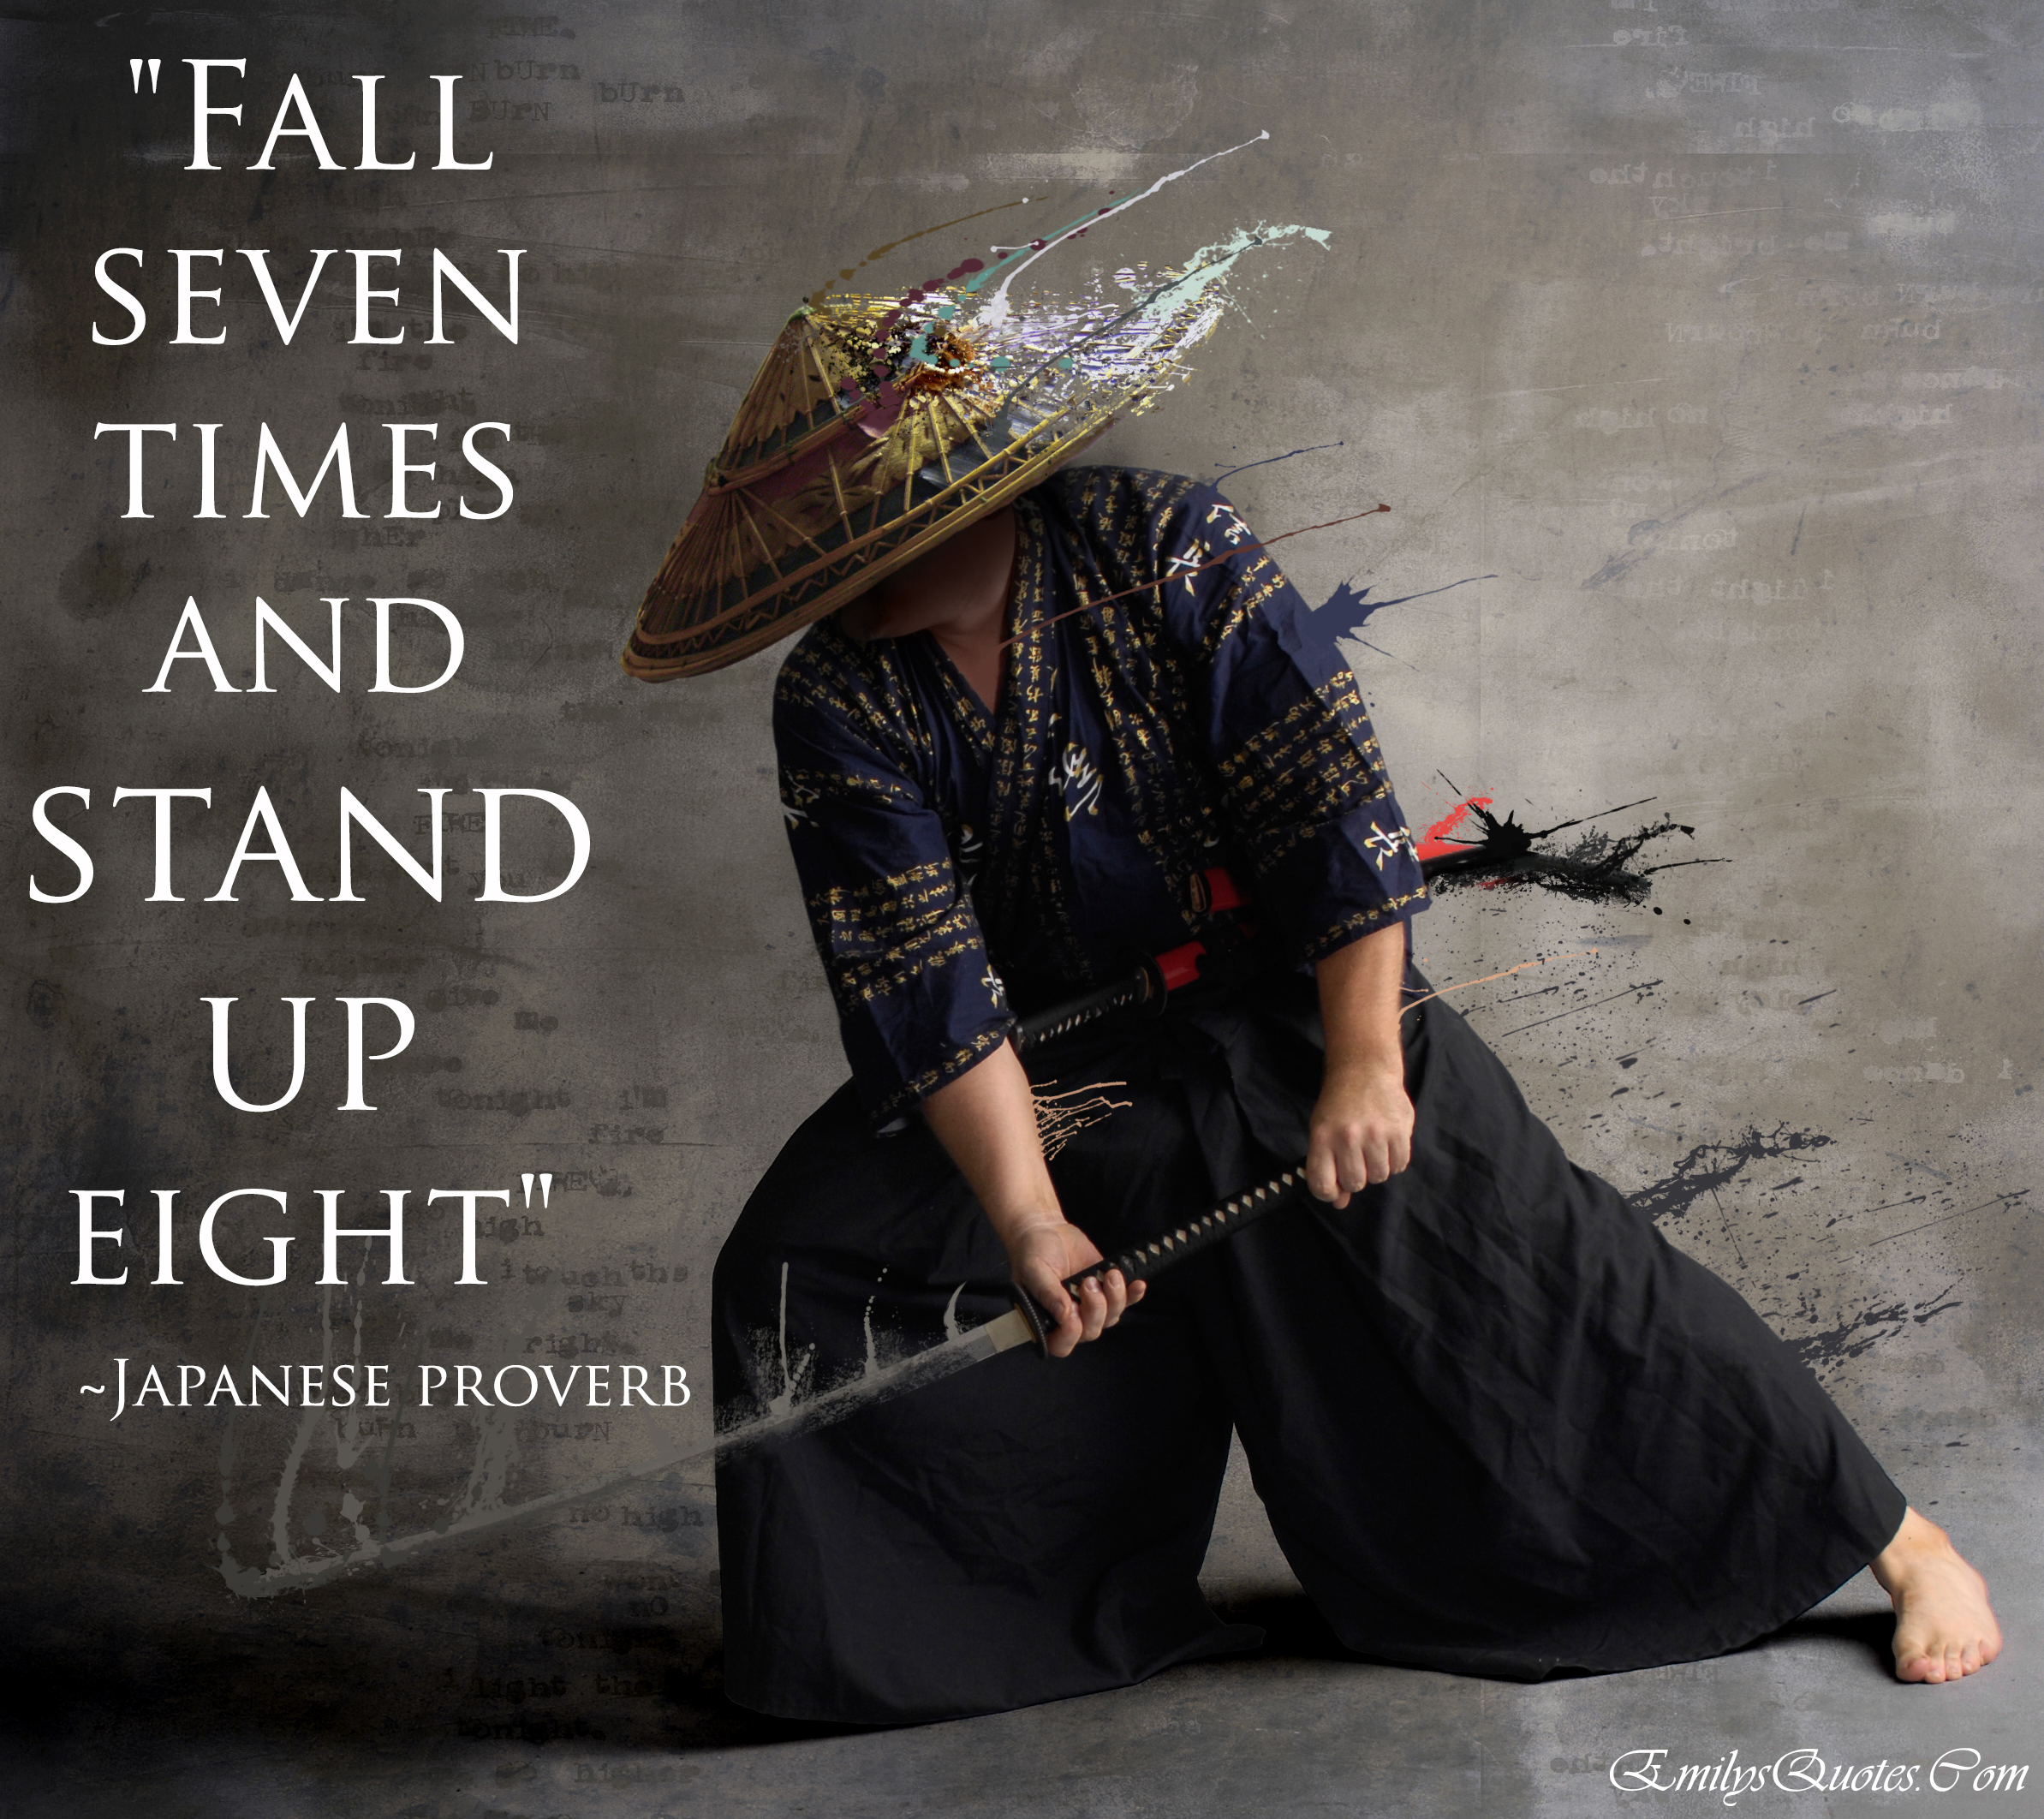 EmilysQuotes.Com - Inspirational, Motivational, Encouraging, Japanese proverb